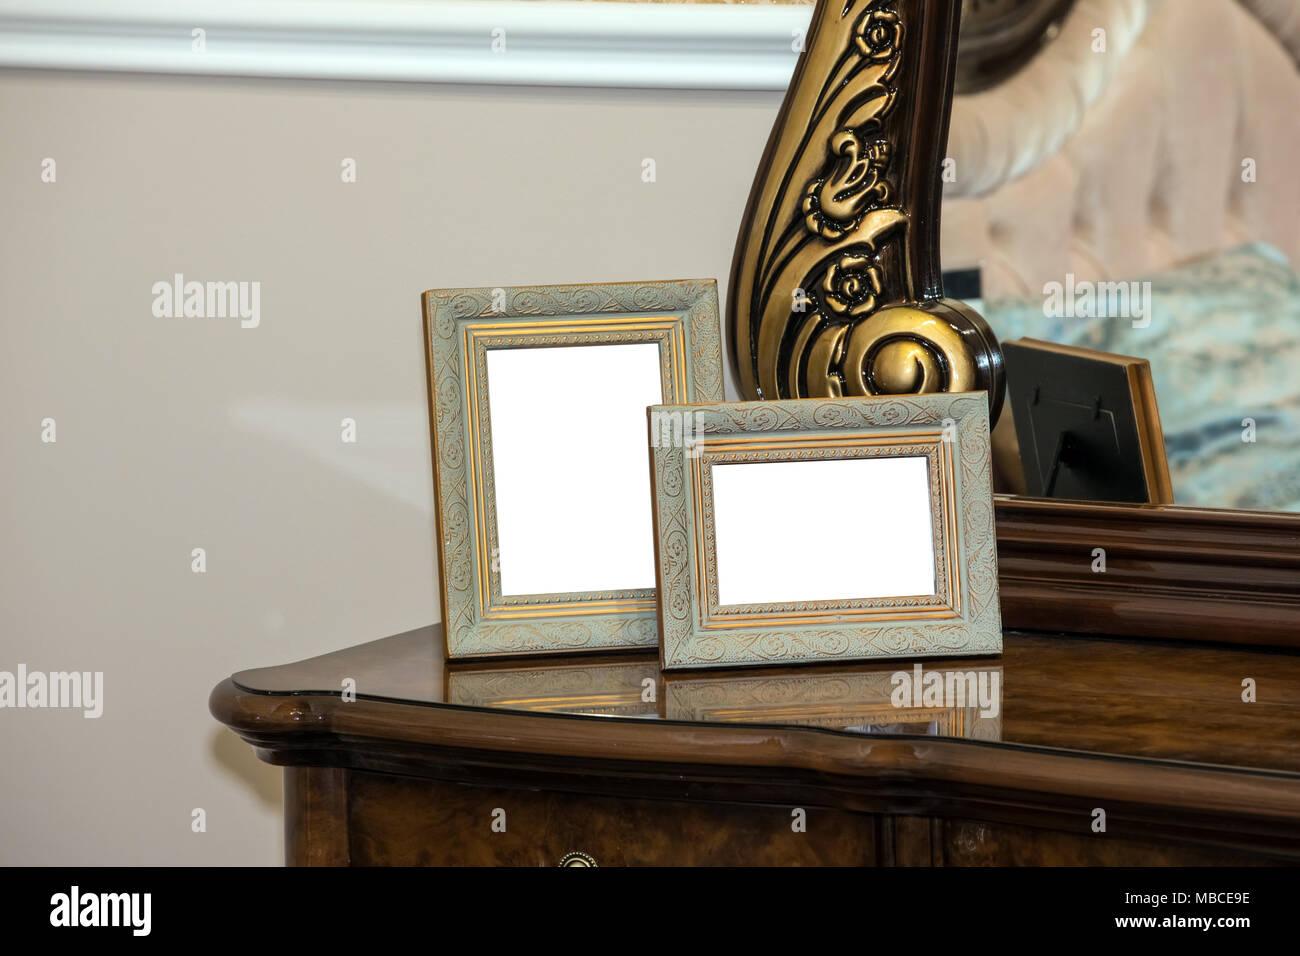 Kommode Mit Zwei Leeren Bilderrahmen Stockfoto Bild 179139562 Alamy